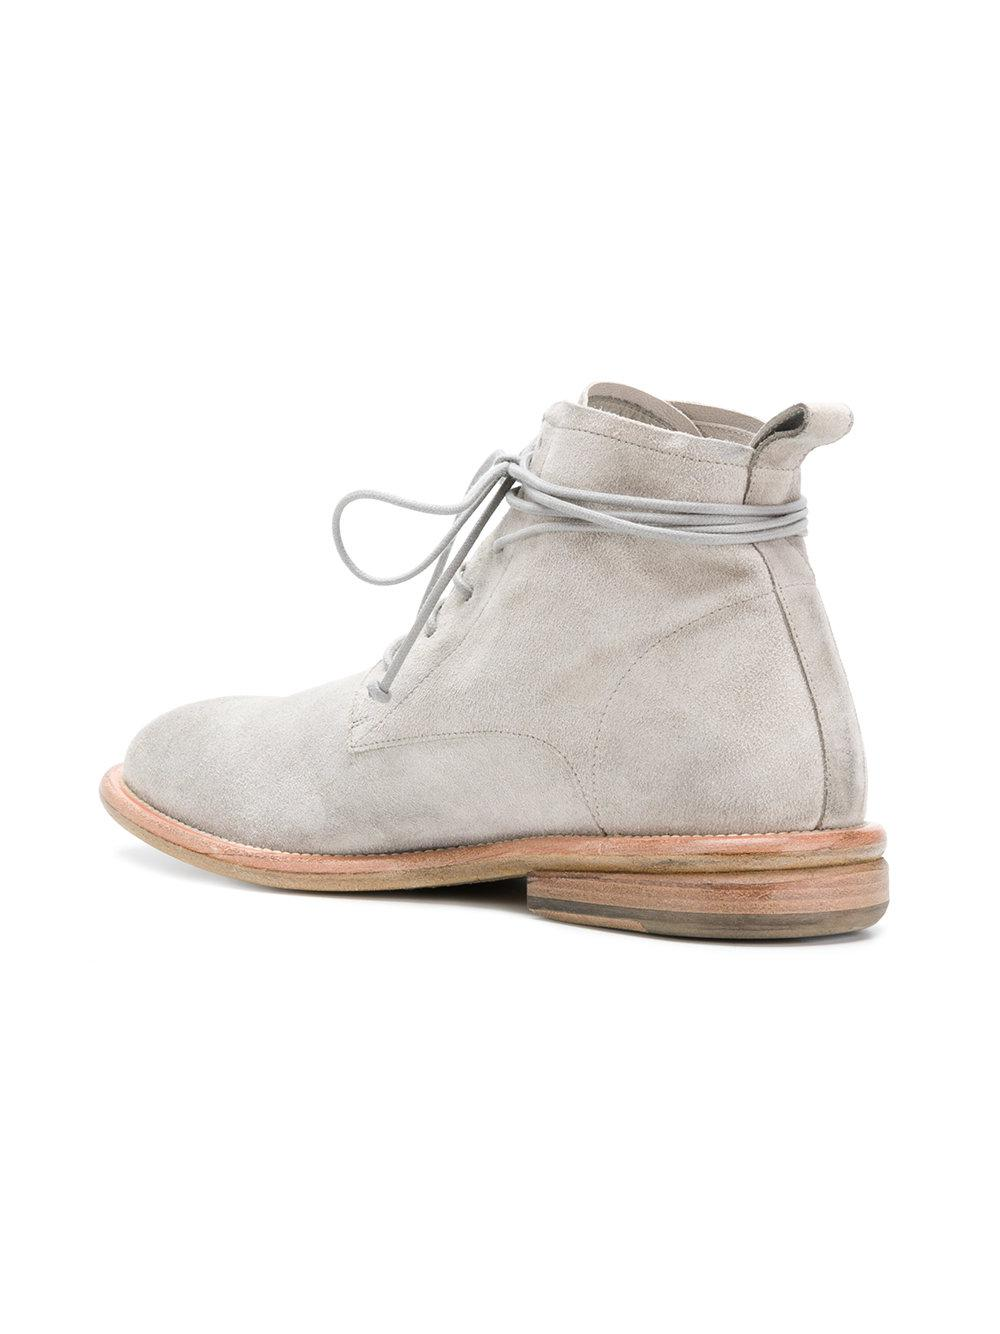 MARSèLLWrap around boots 5j7JomNeuz